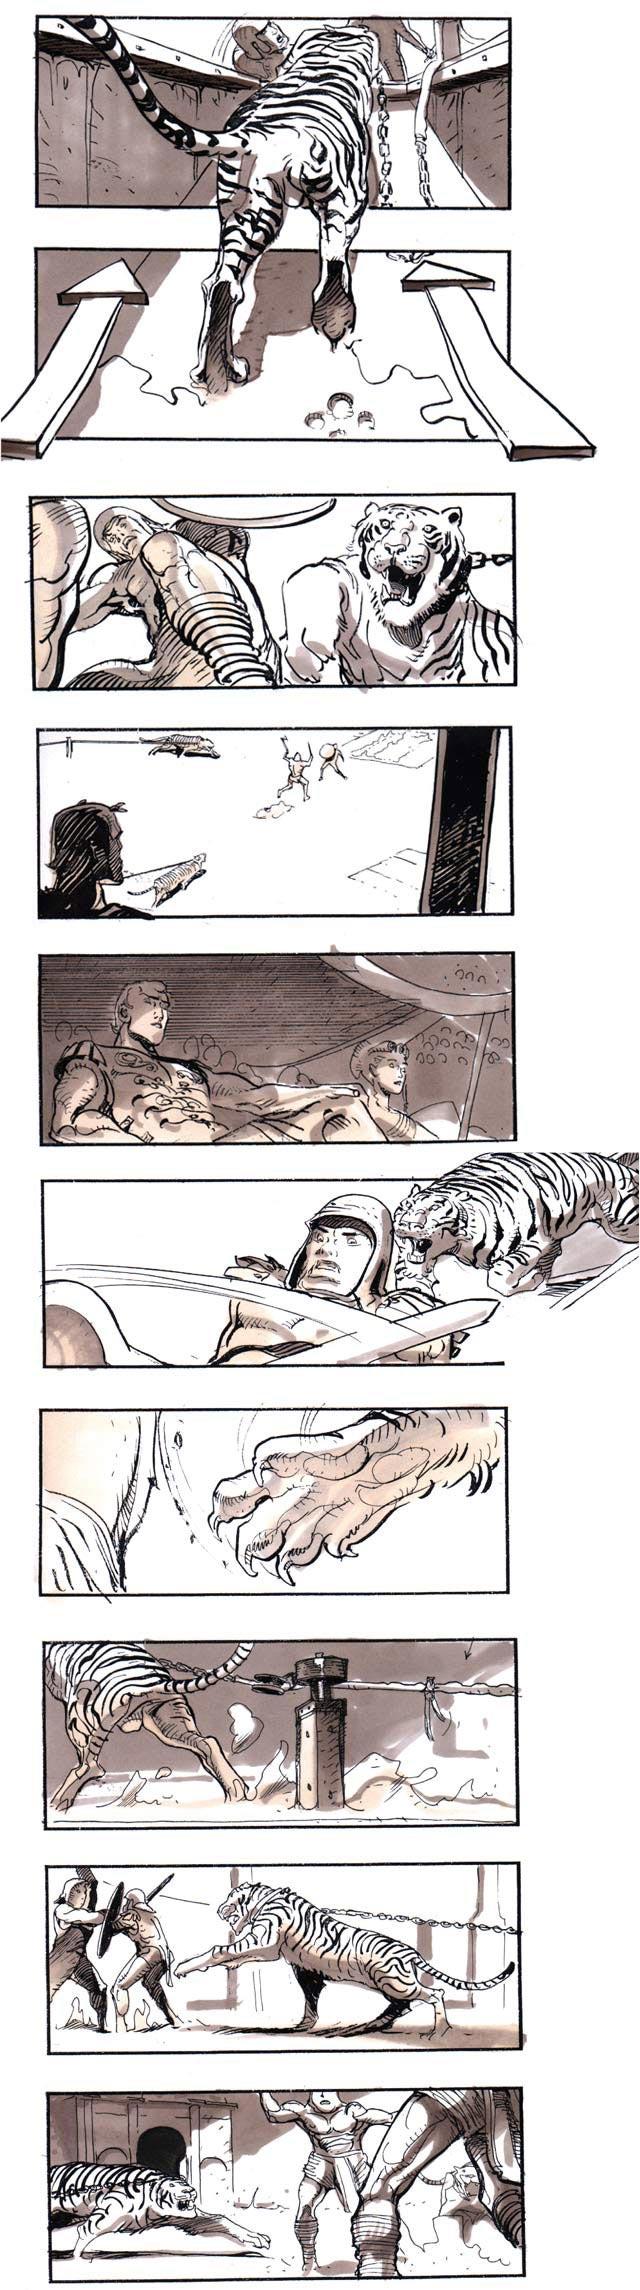 gladiator-storyboard-by-Sylvain-Despretz